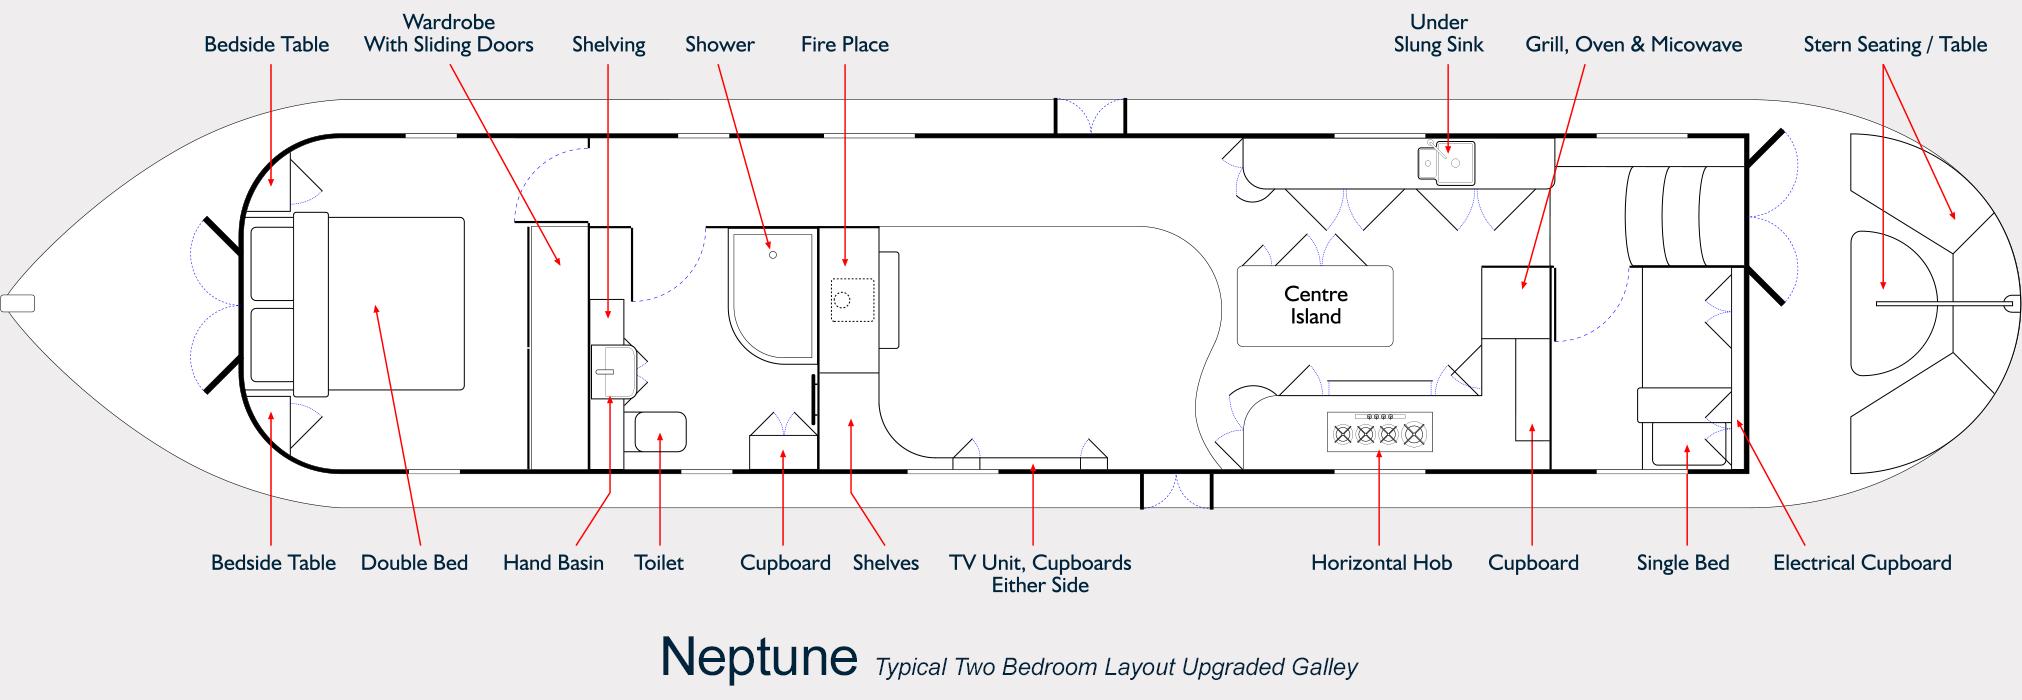 Neptune Barge Floor Plan - Upgraded Galley